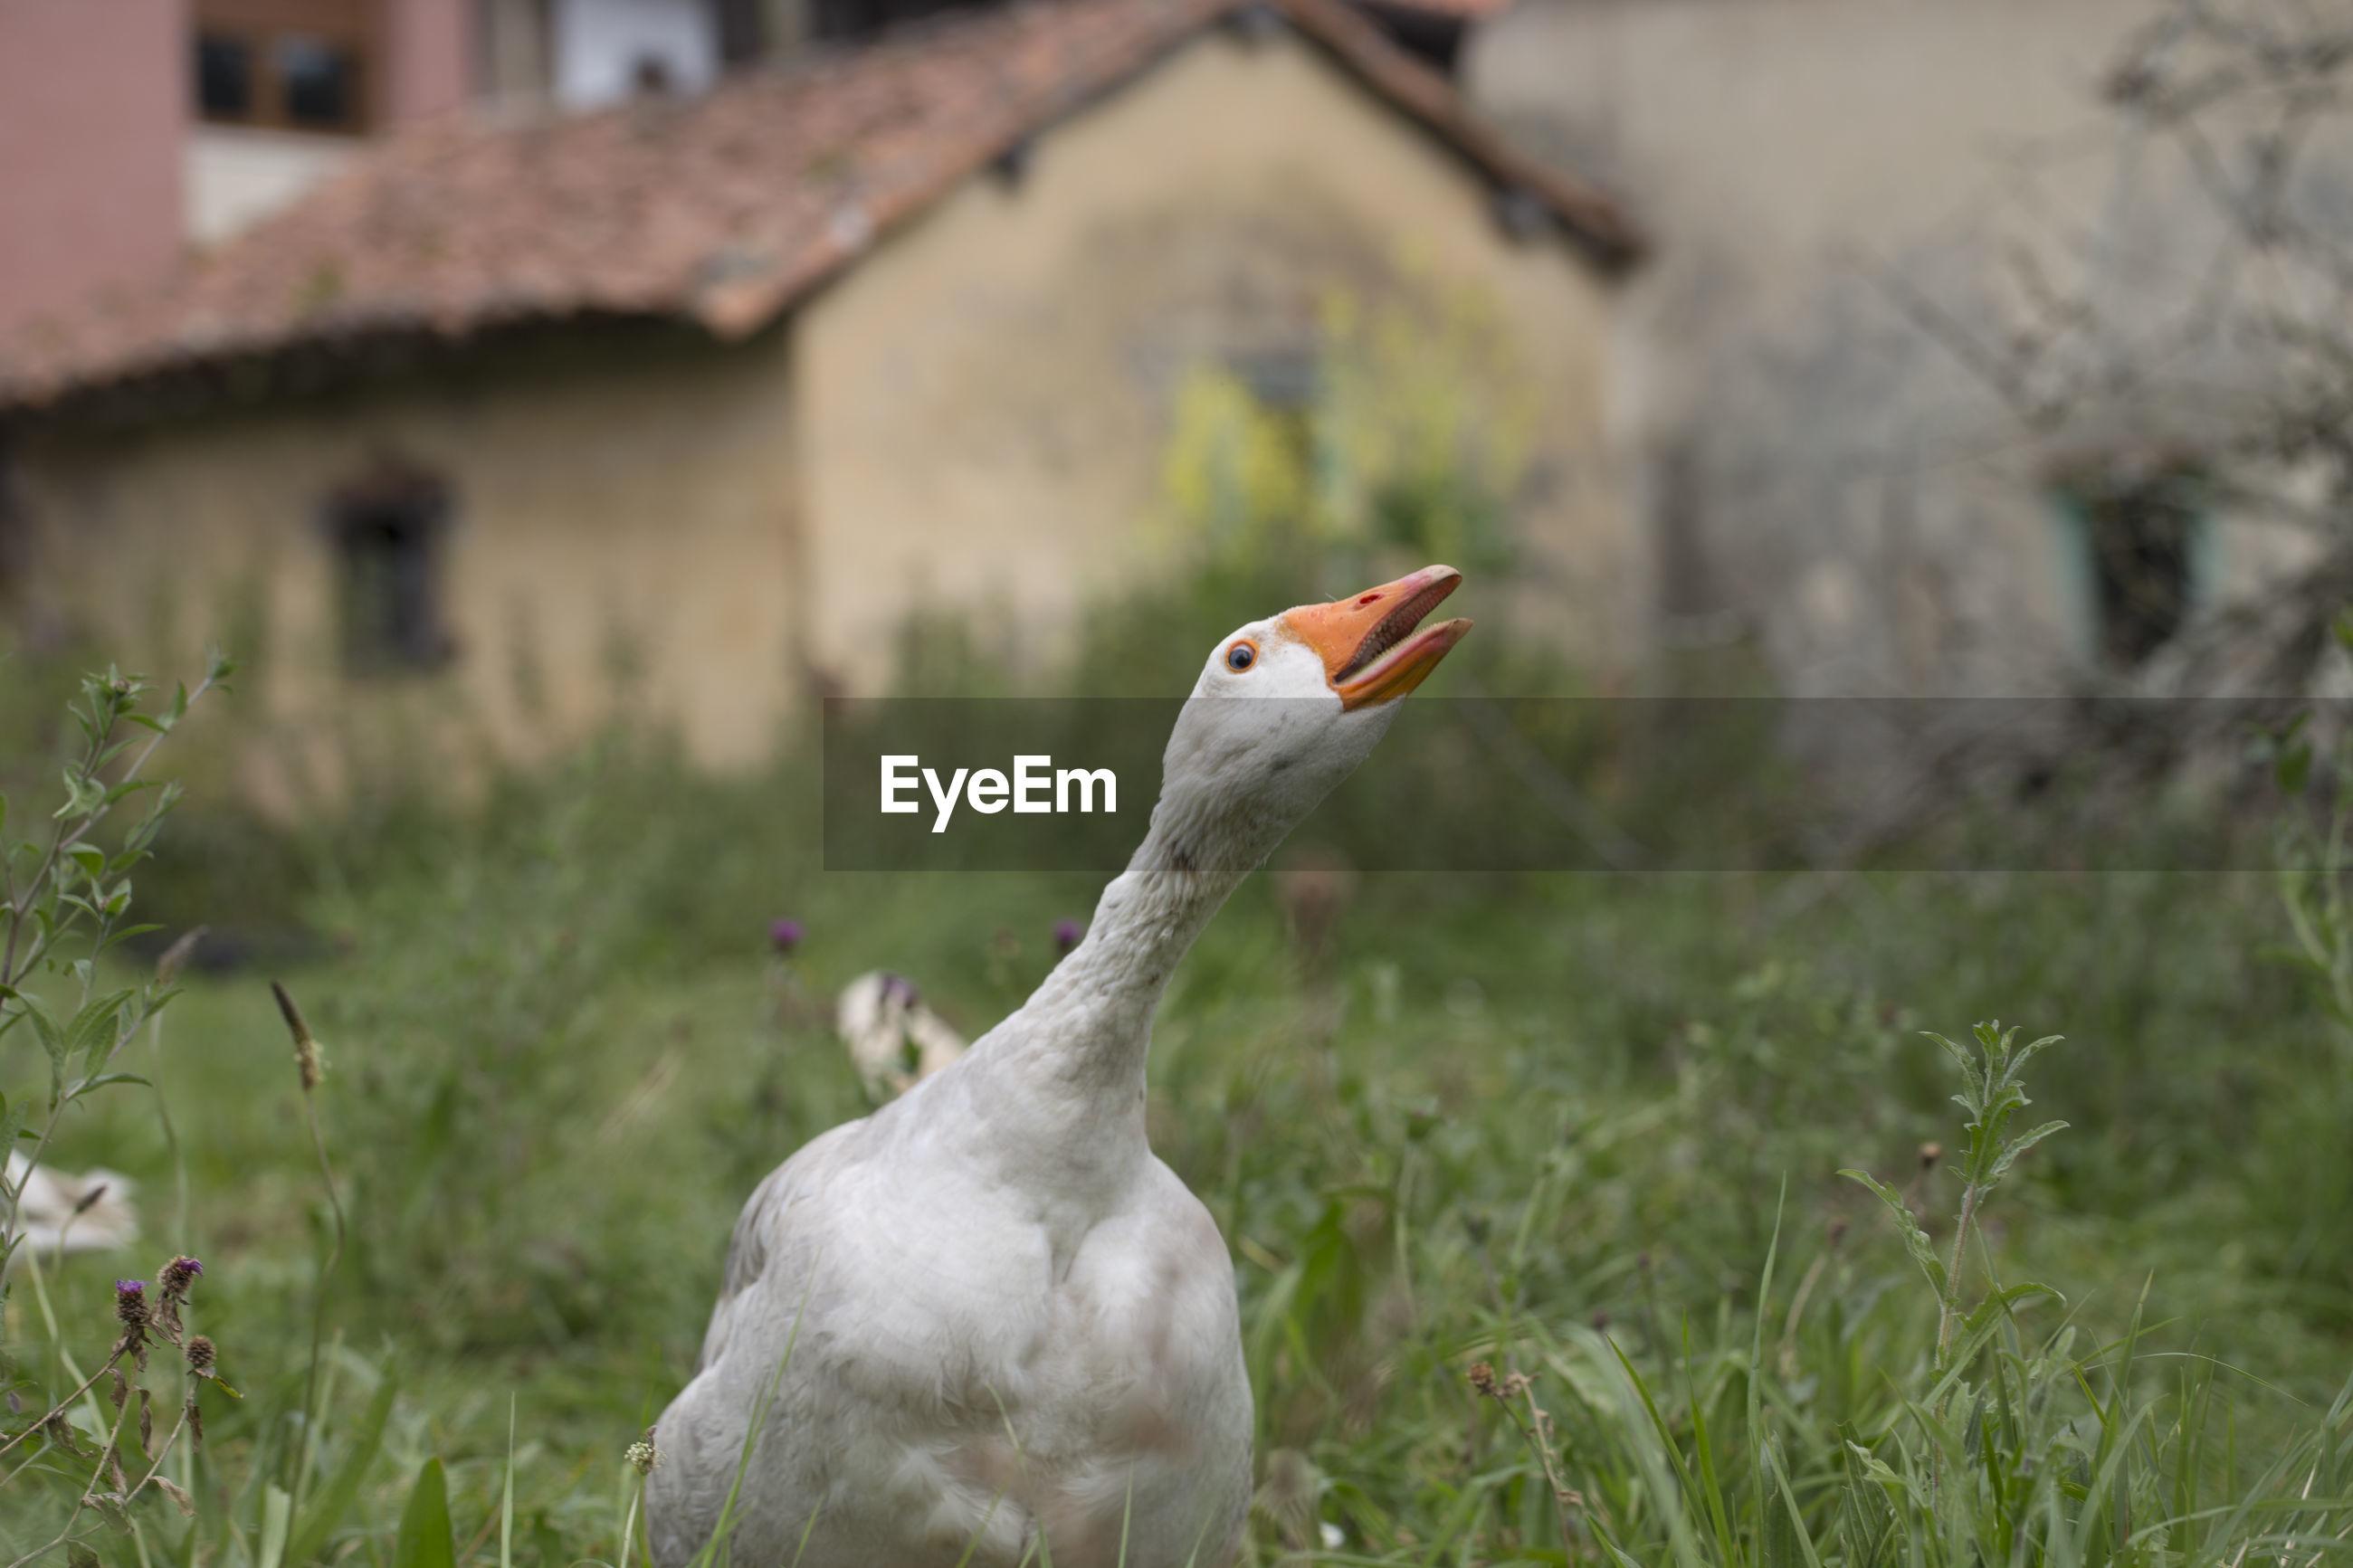 White goose amidst grassy field